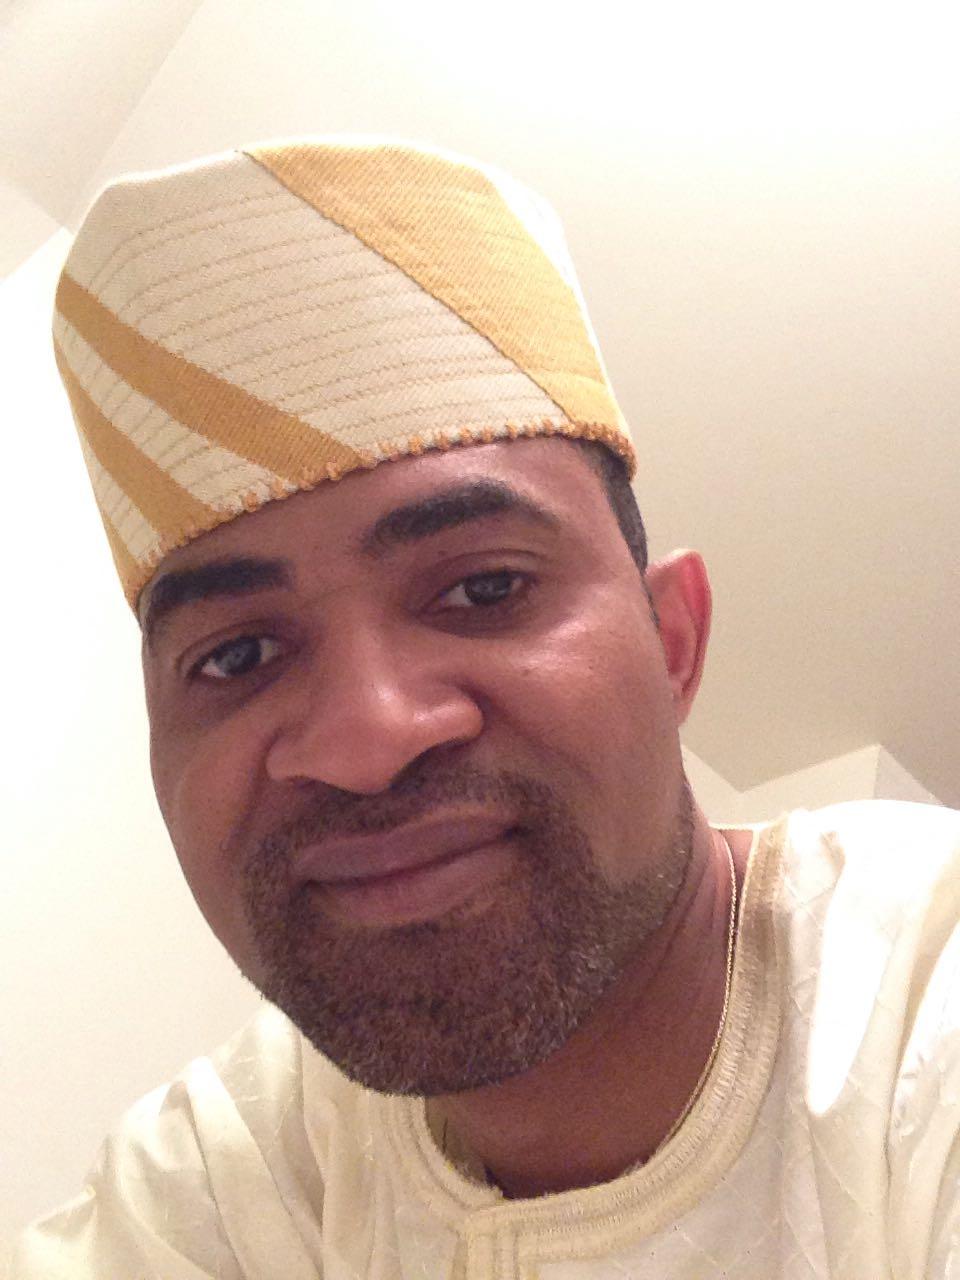 Ogun 2019: Canada Based Bizman, Gbenga Oni Mobilizes Support For Yayi In Diaspora